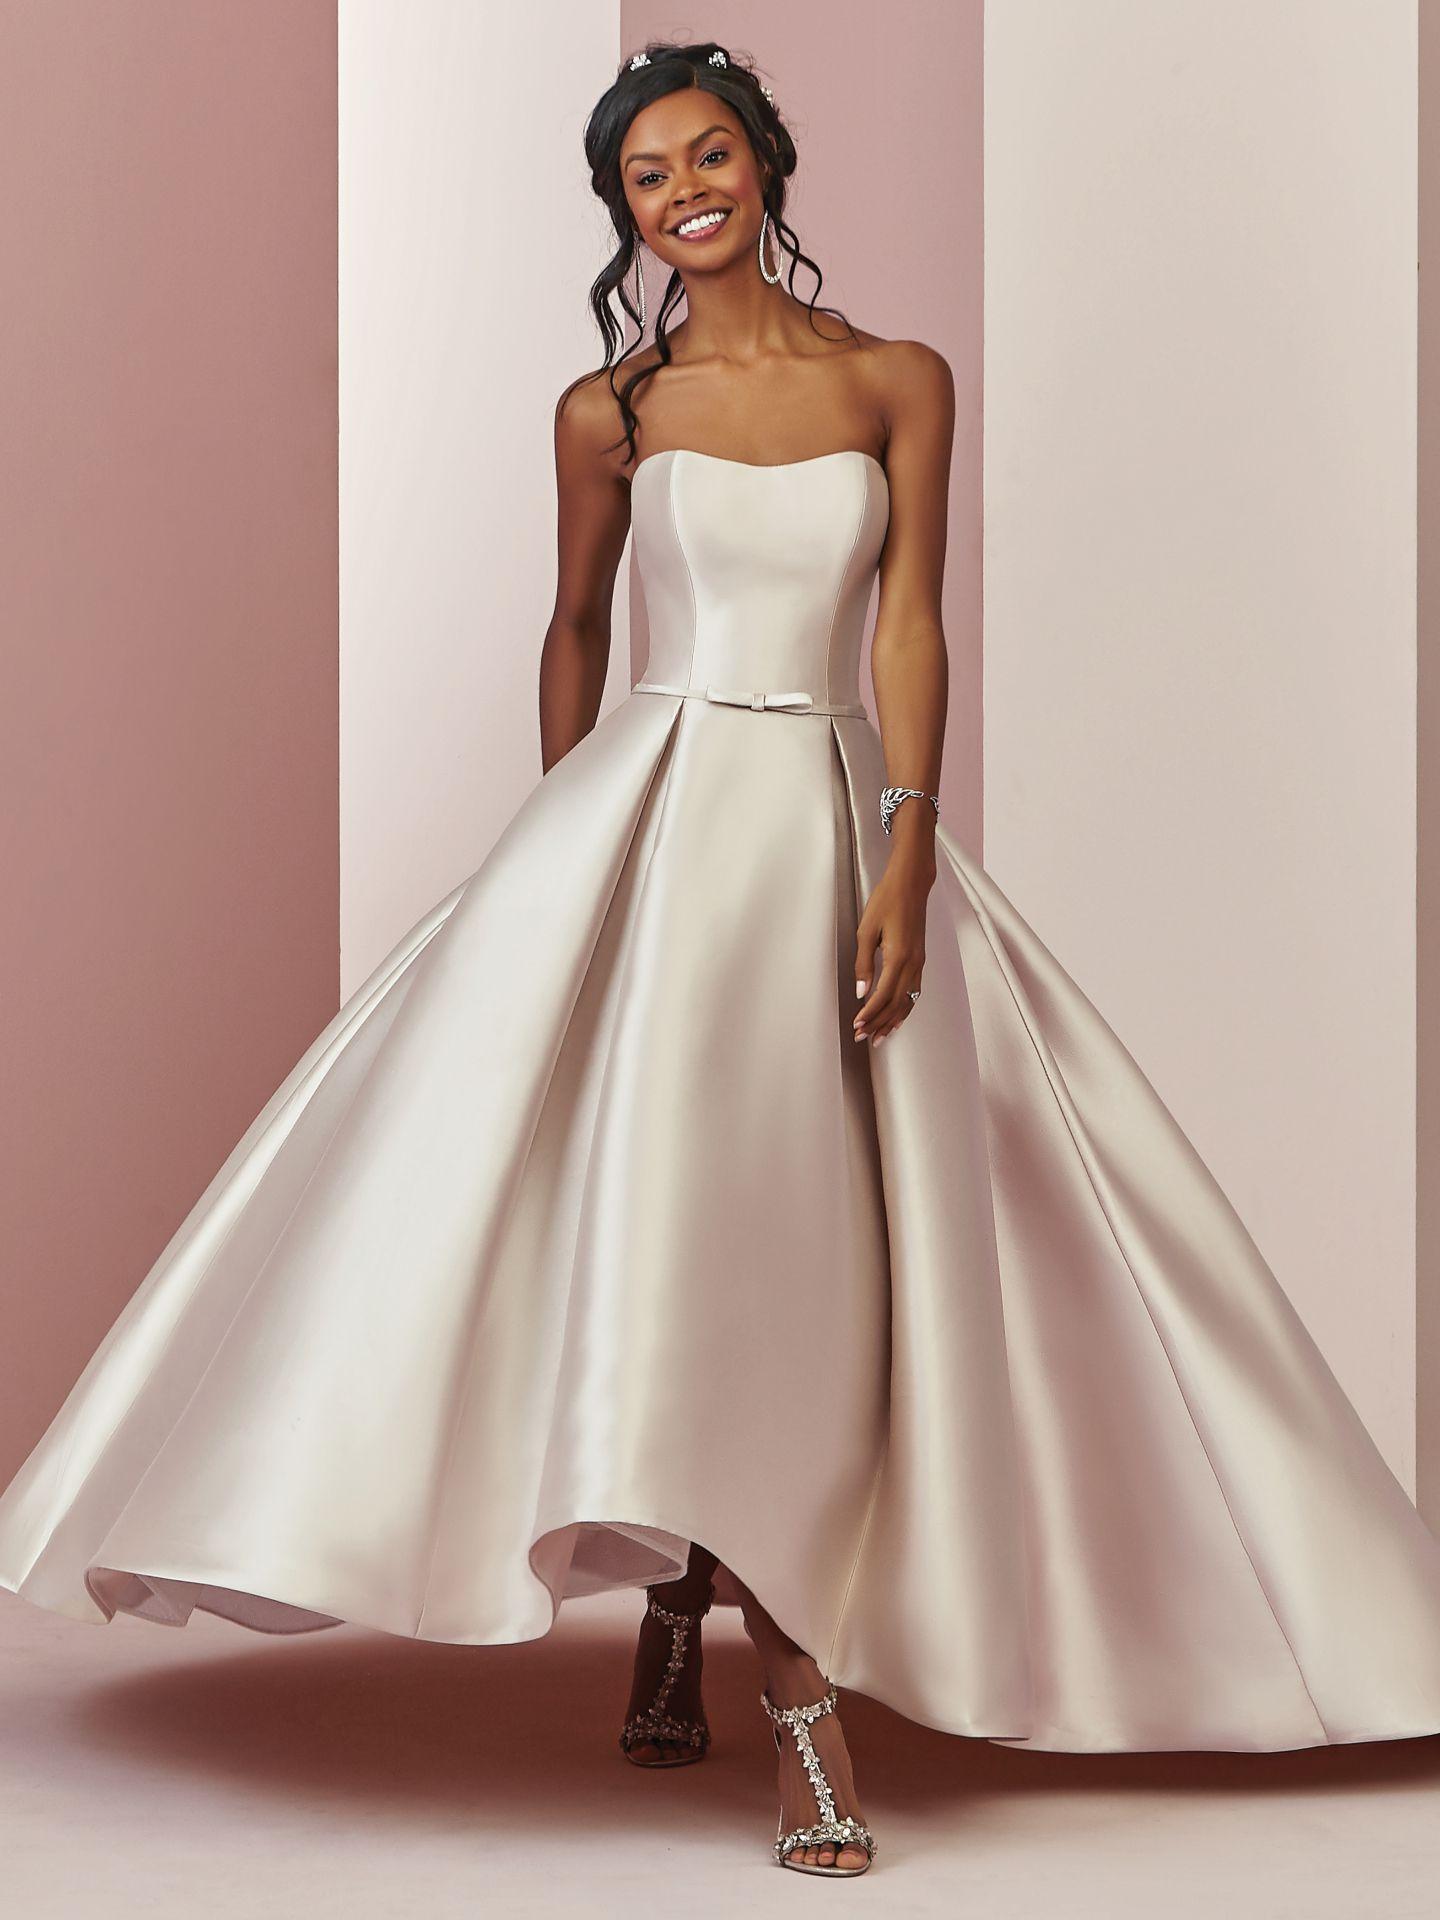 11+ Erica wedding dress info